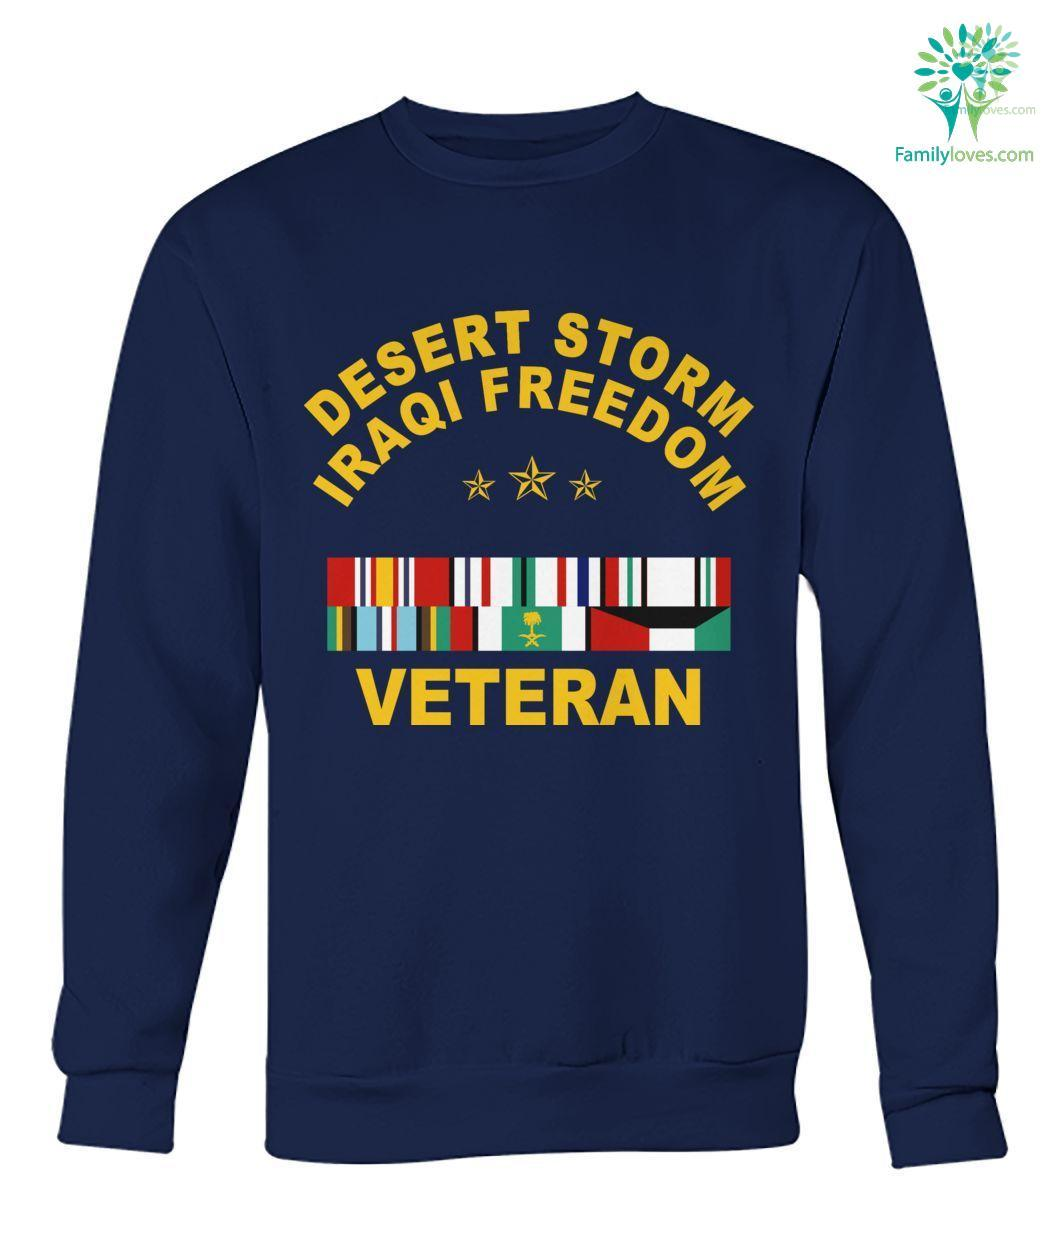 Desert storm iraqi freedom veteran hoodie, sweatshirt, t-shirt %tag familyloves.com